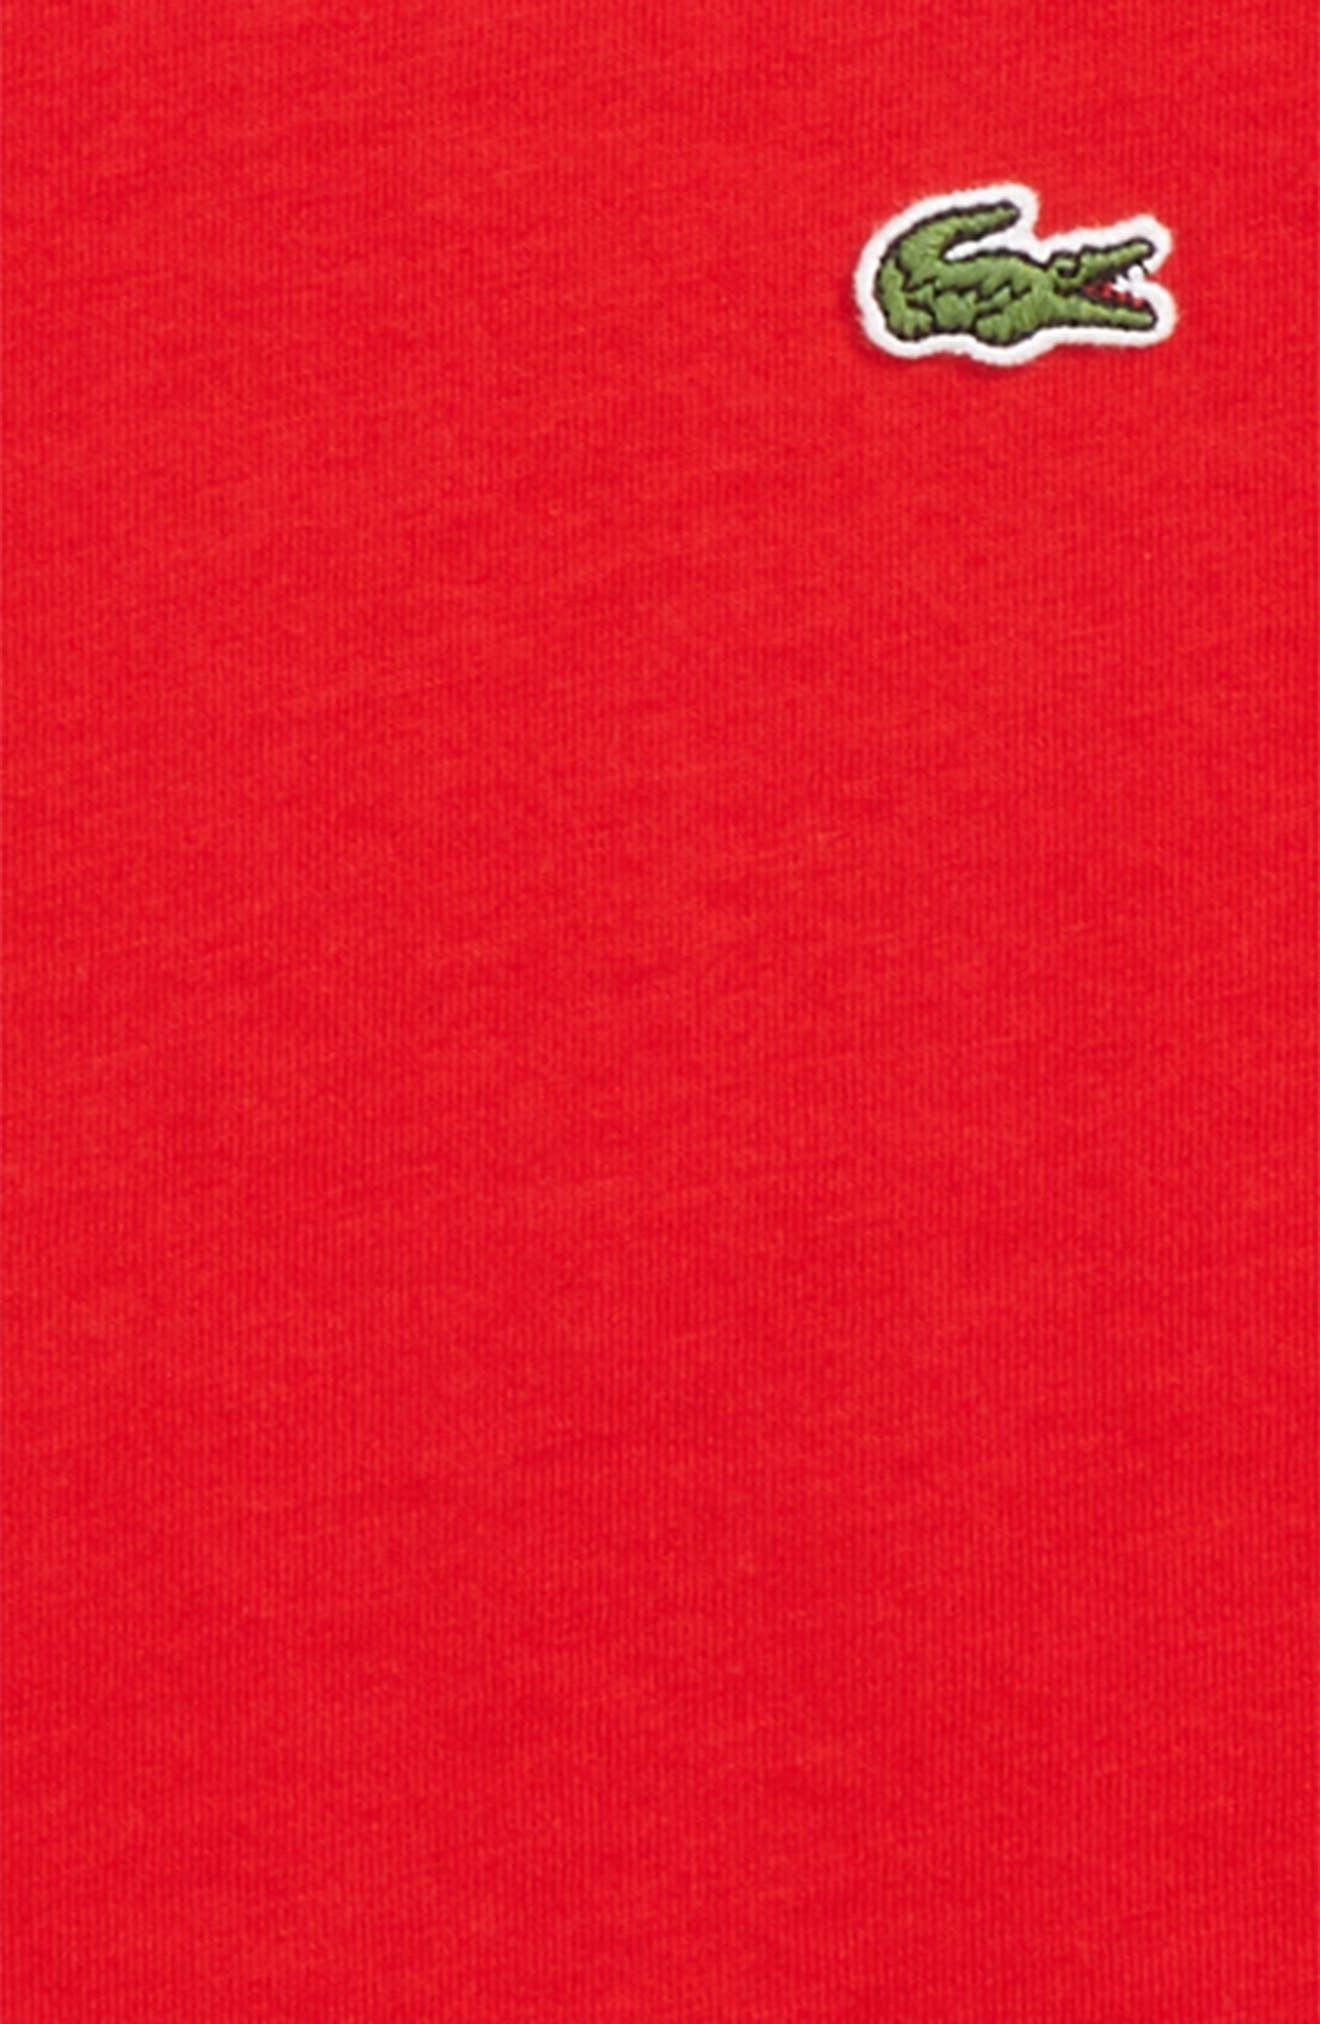 Solid V-Neck T-Shirt,                             Alternate thumbnail 2, color,                             RED